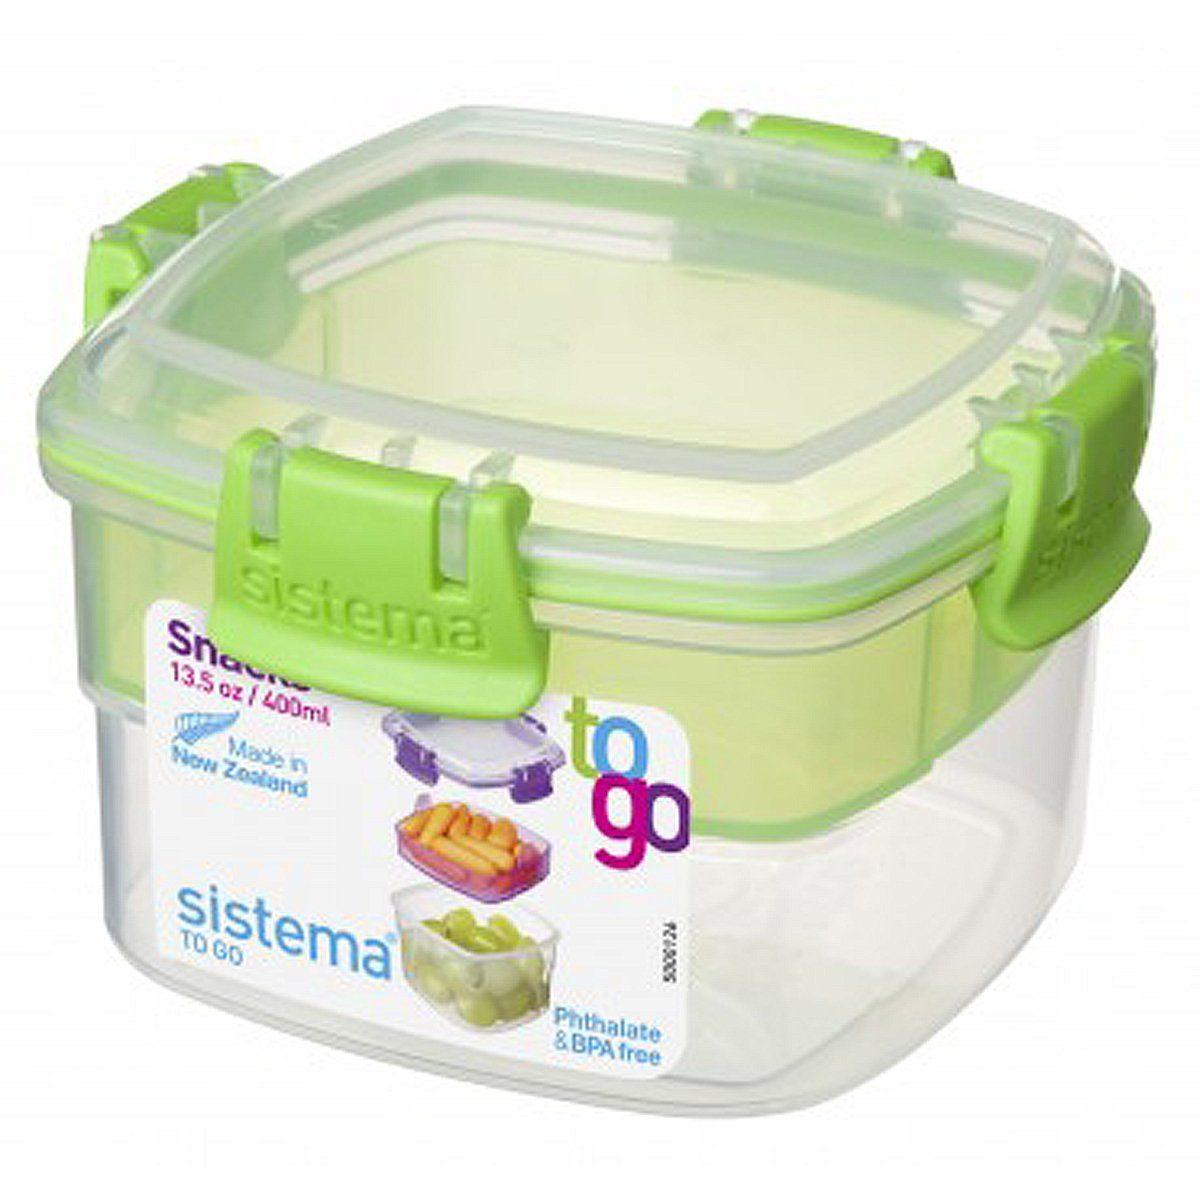 sistema sistema Aufbewahrungsbox Snack To Go 2er Set blau, grün